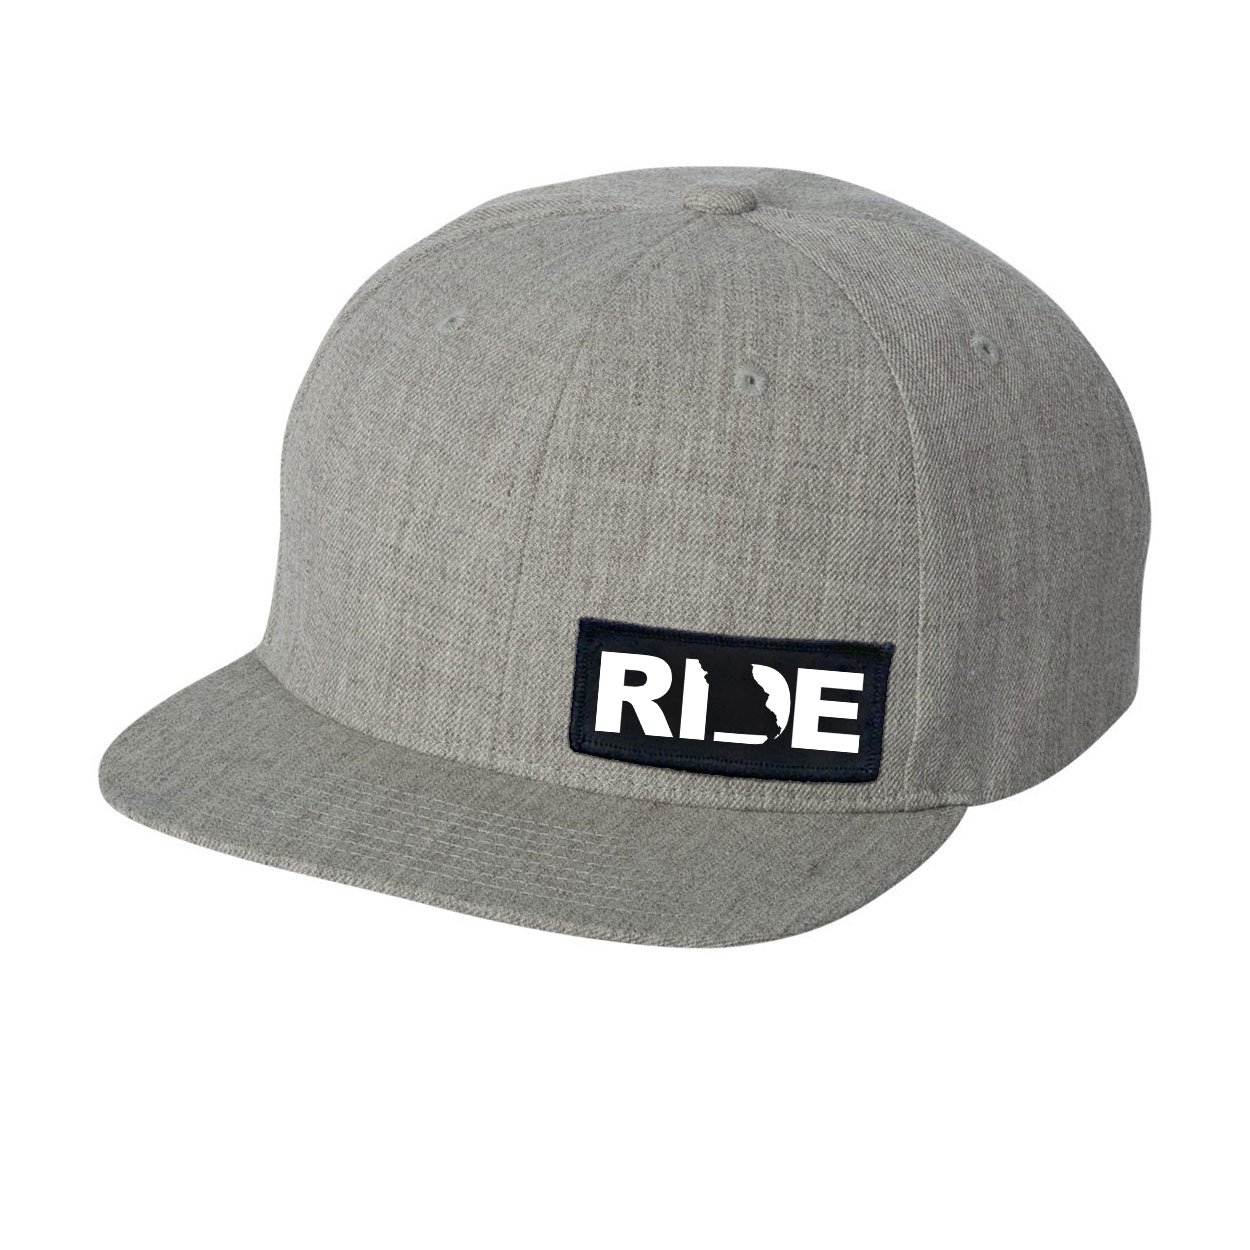 Ride Missouri Night Out Woven Patch Flat Brim Snapback Hat Heather Gray (White Logo)